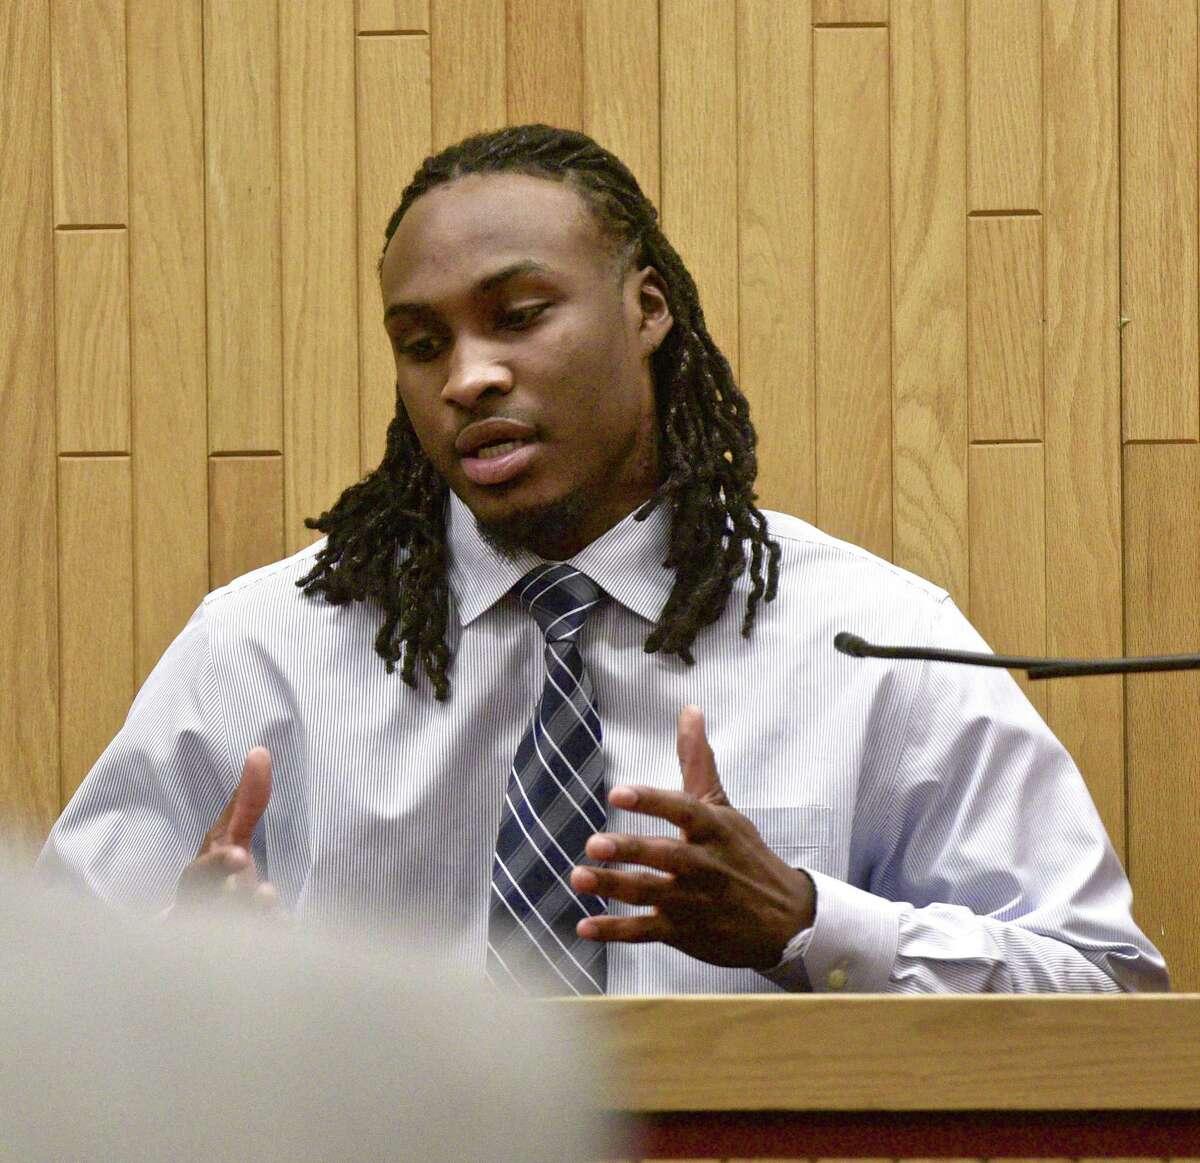 Murder suspect Garfield Sanderson testifies during his trial at Superior Court, in Danbury, on Thursday, March 30, 2017, in Danbury, Conn.